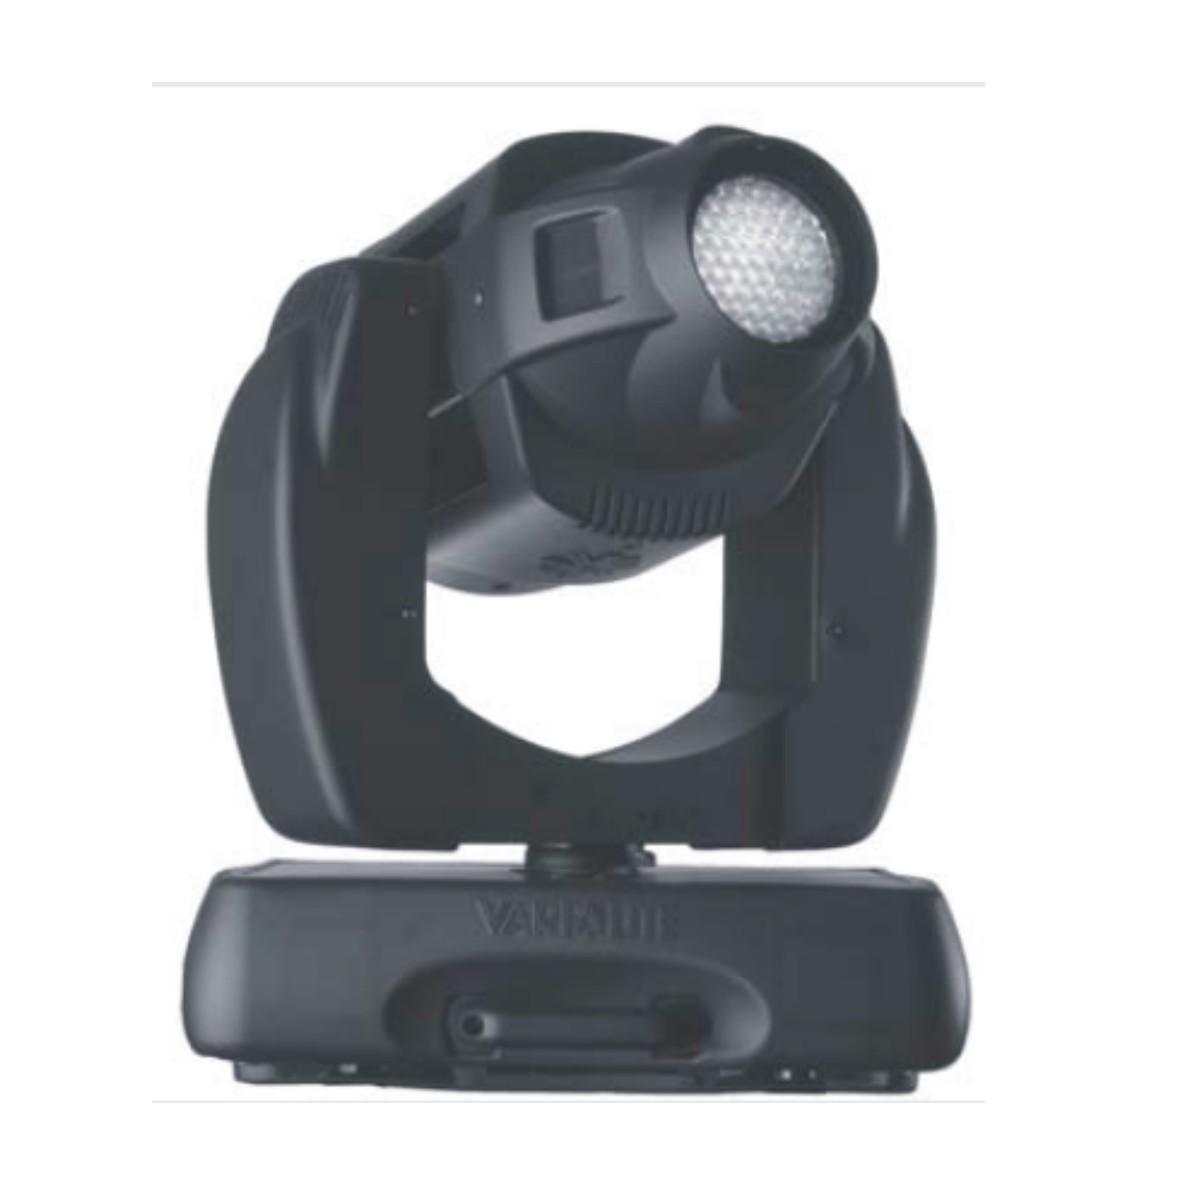 VariLIte VL2500 Wash 电脑摇头染色灯